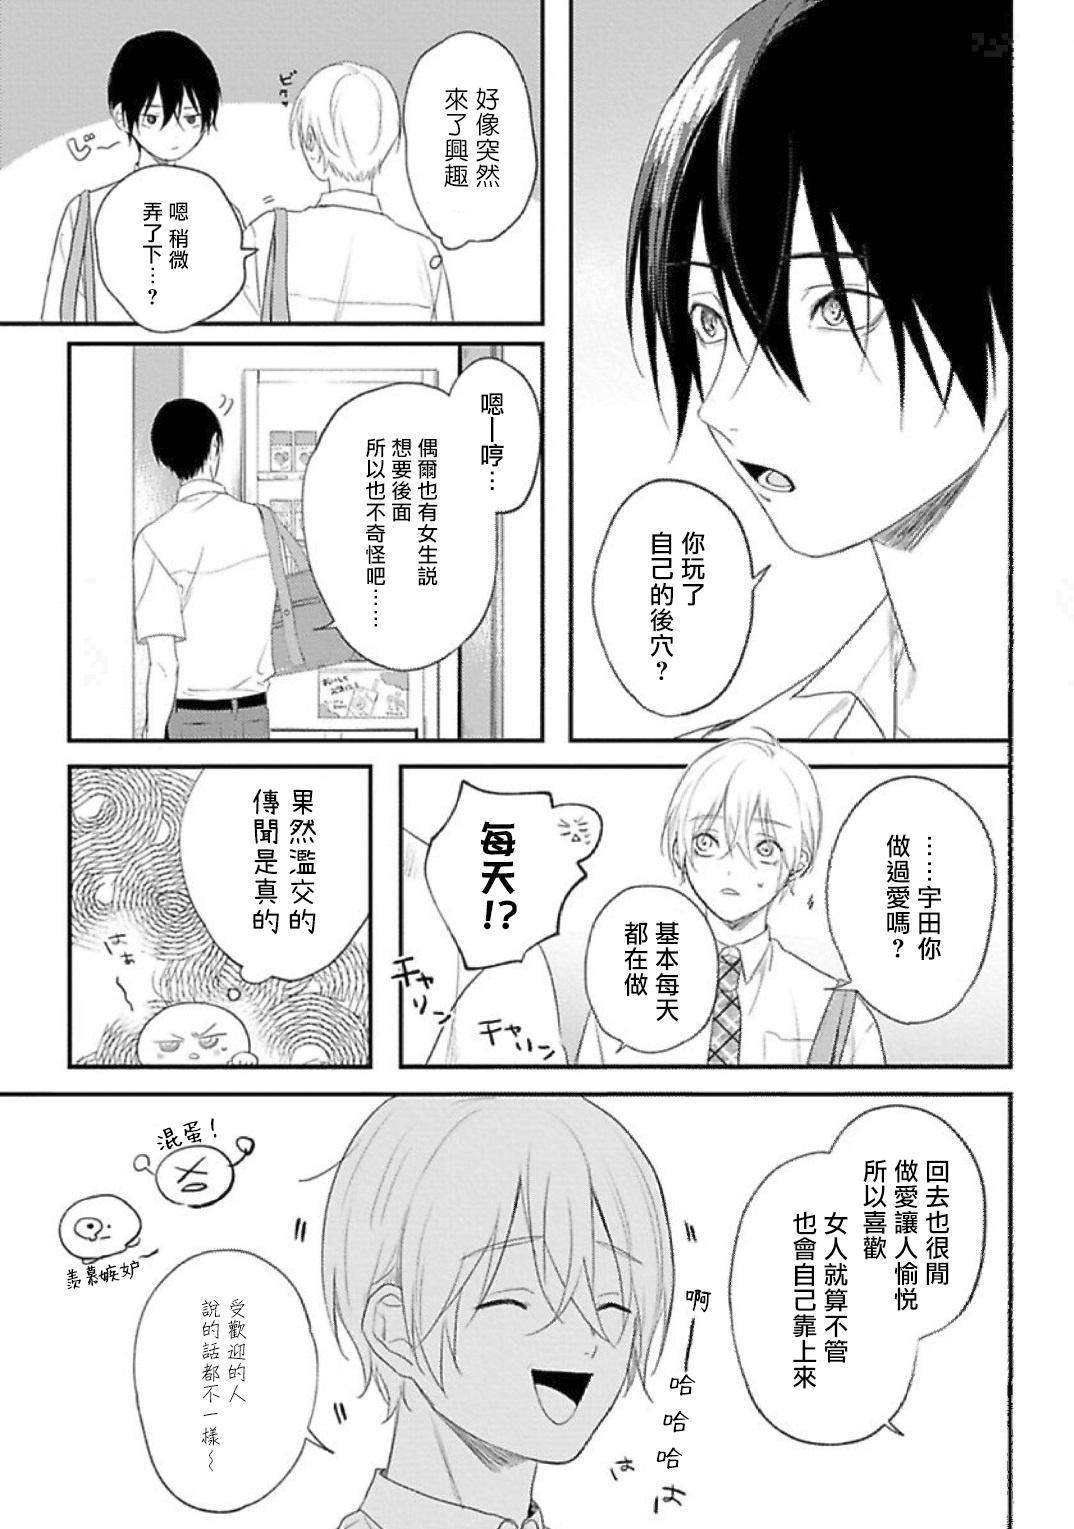 [Utata Hakuto] Houkago Virginity - Virginity afterschool 1-5 完结 [Chinese] [拾荒者汉化组] [Digital] 18